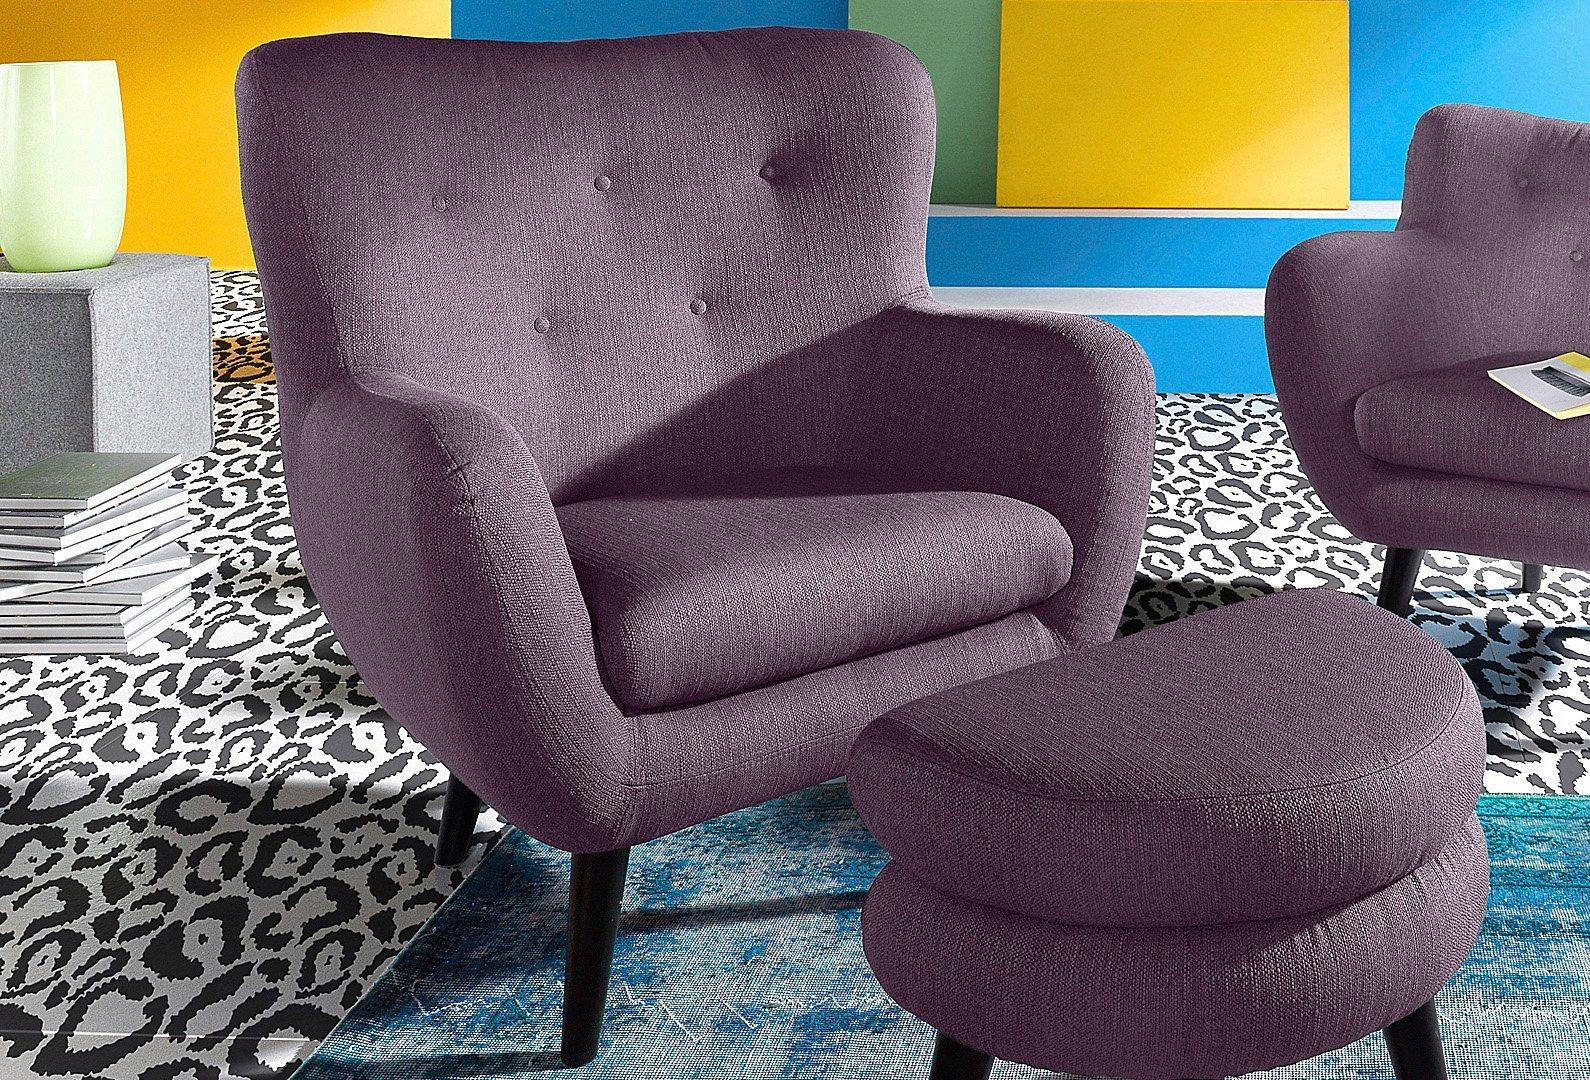 INOSIGN Loungesessel im Retro-Style   Wohnzimmer > Sessel > Loungesessel   Microfaser   INOSIGN